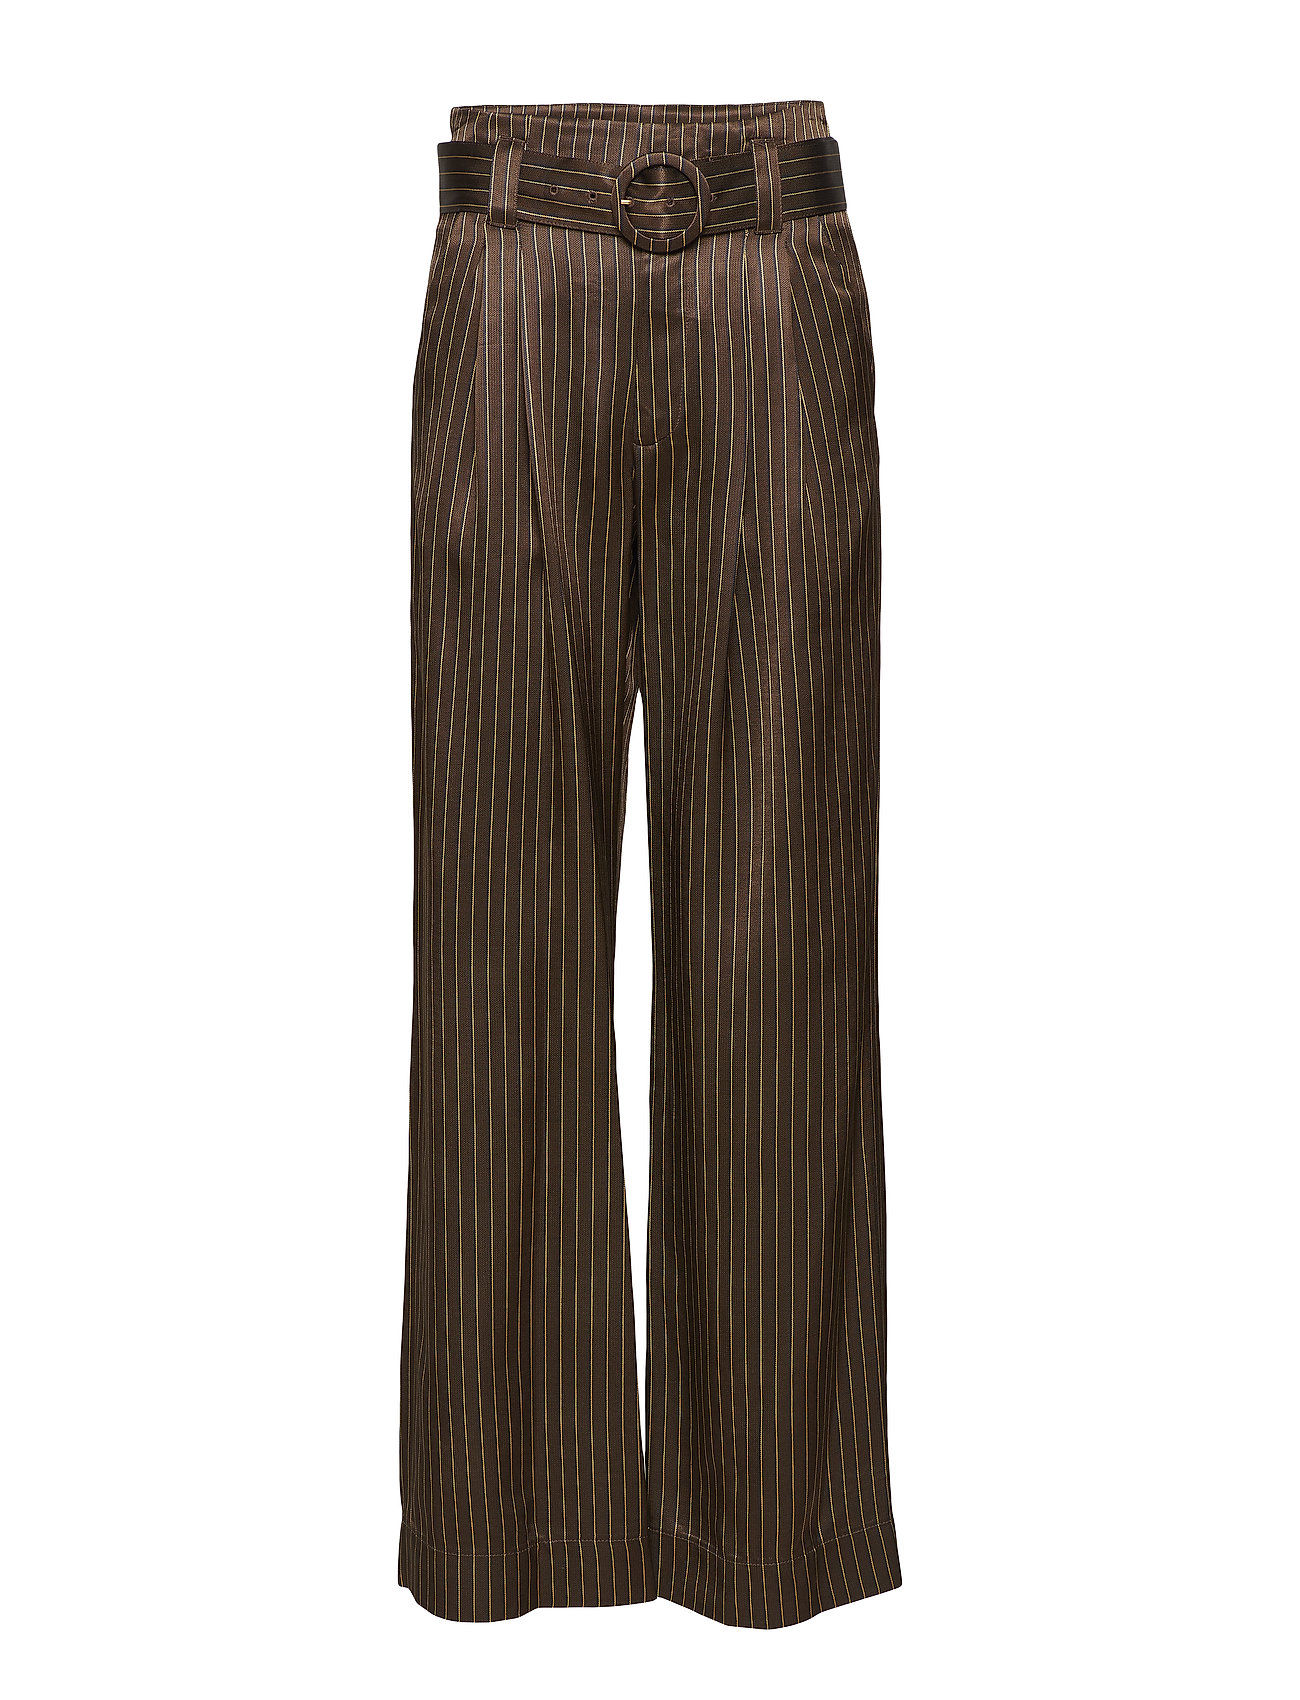 Gestuz Strika pants MA18 - BROWN STRIBE